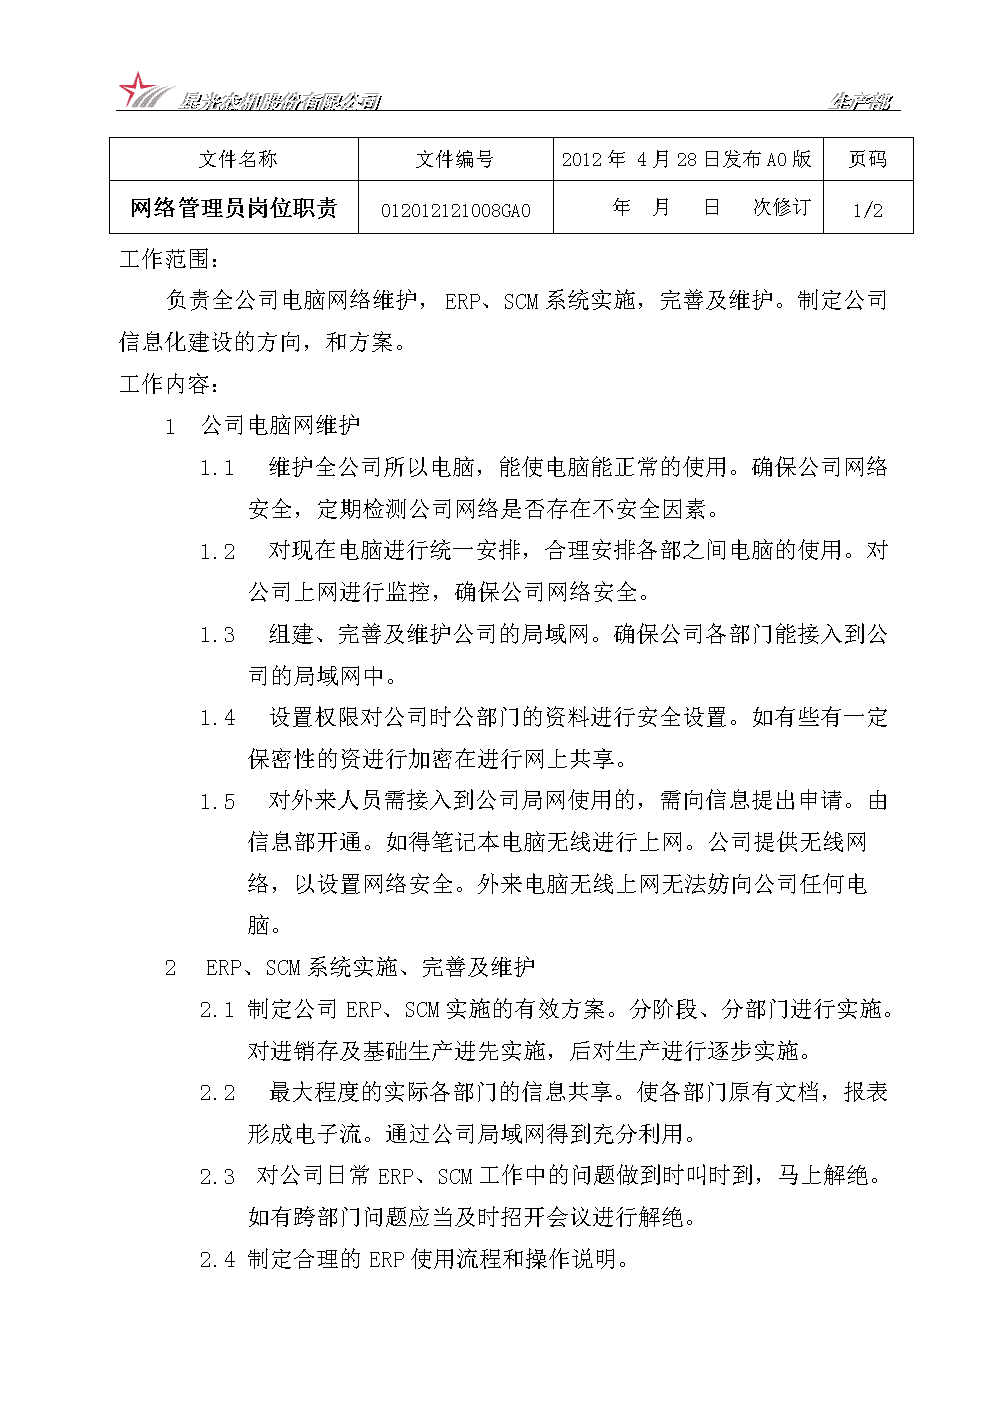 q網絡管理員崗位職責.doc